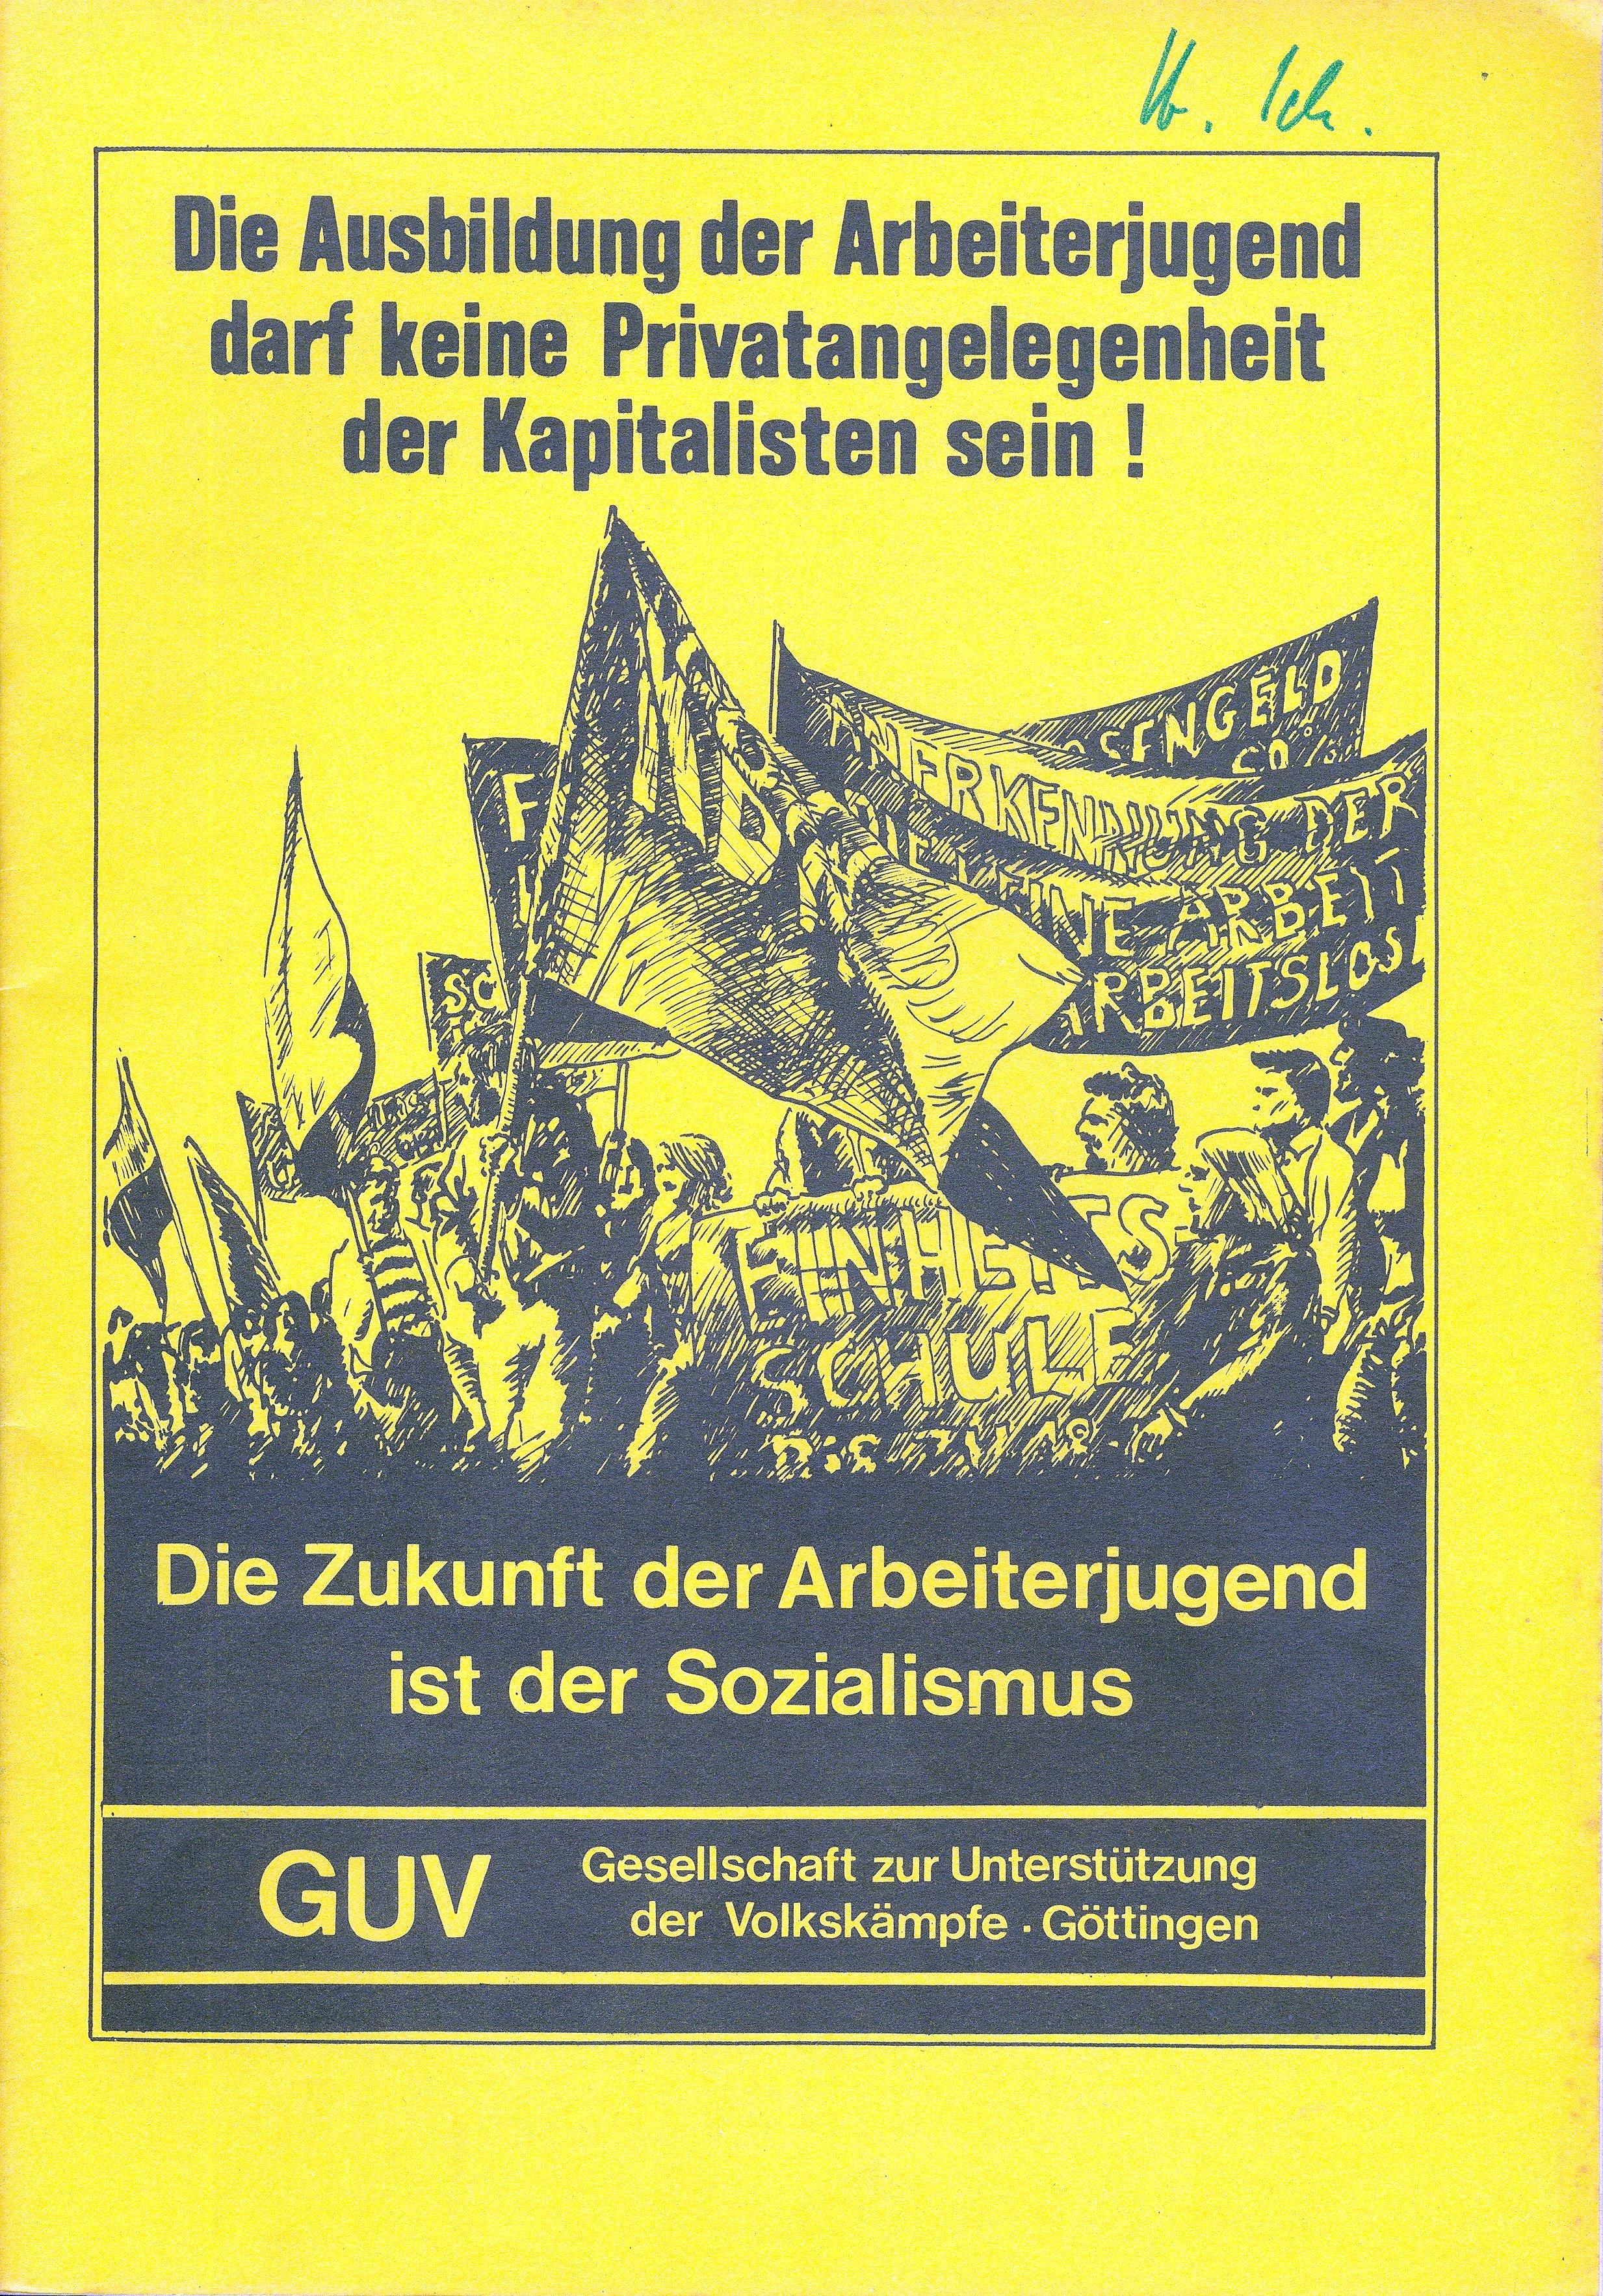 Goettingen_GUV_Arbeiterjugend001